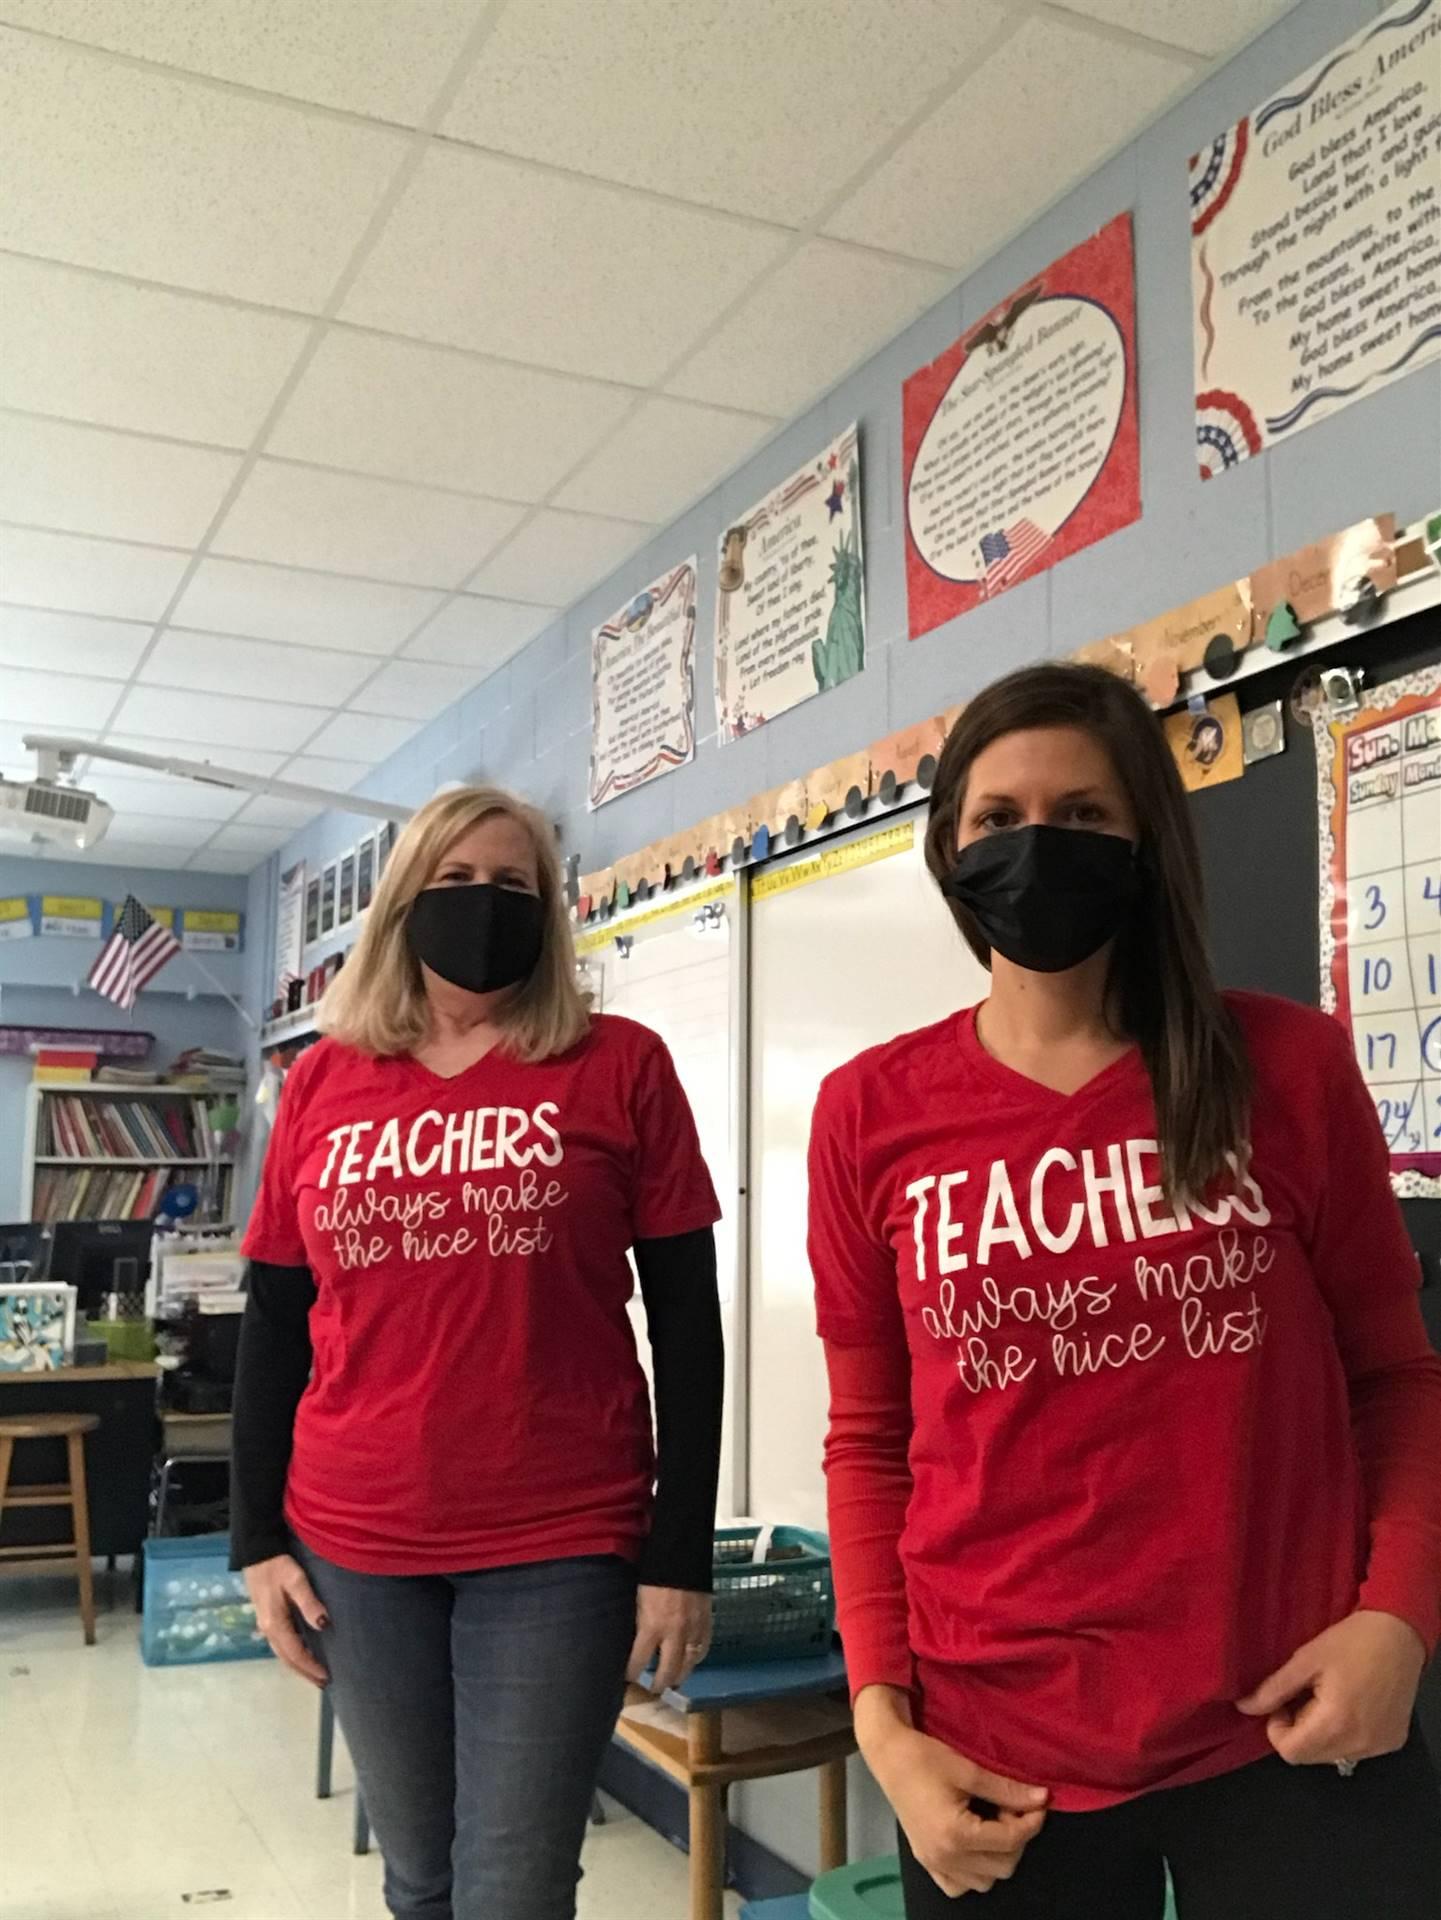 Teachers in matching shirts